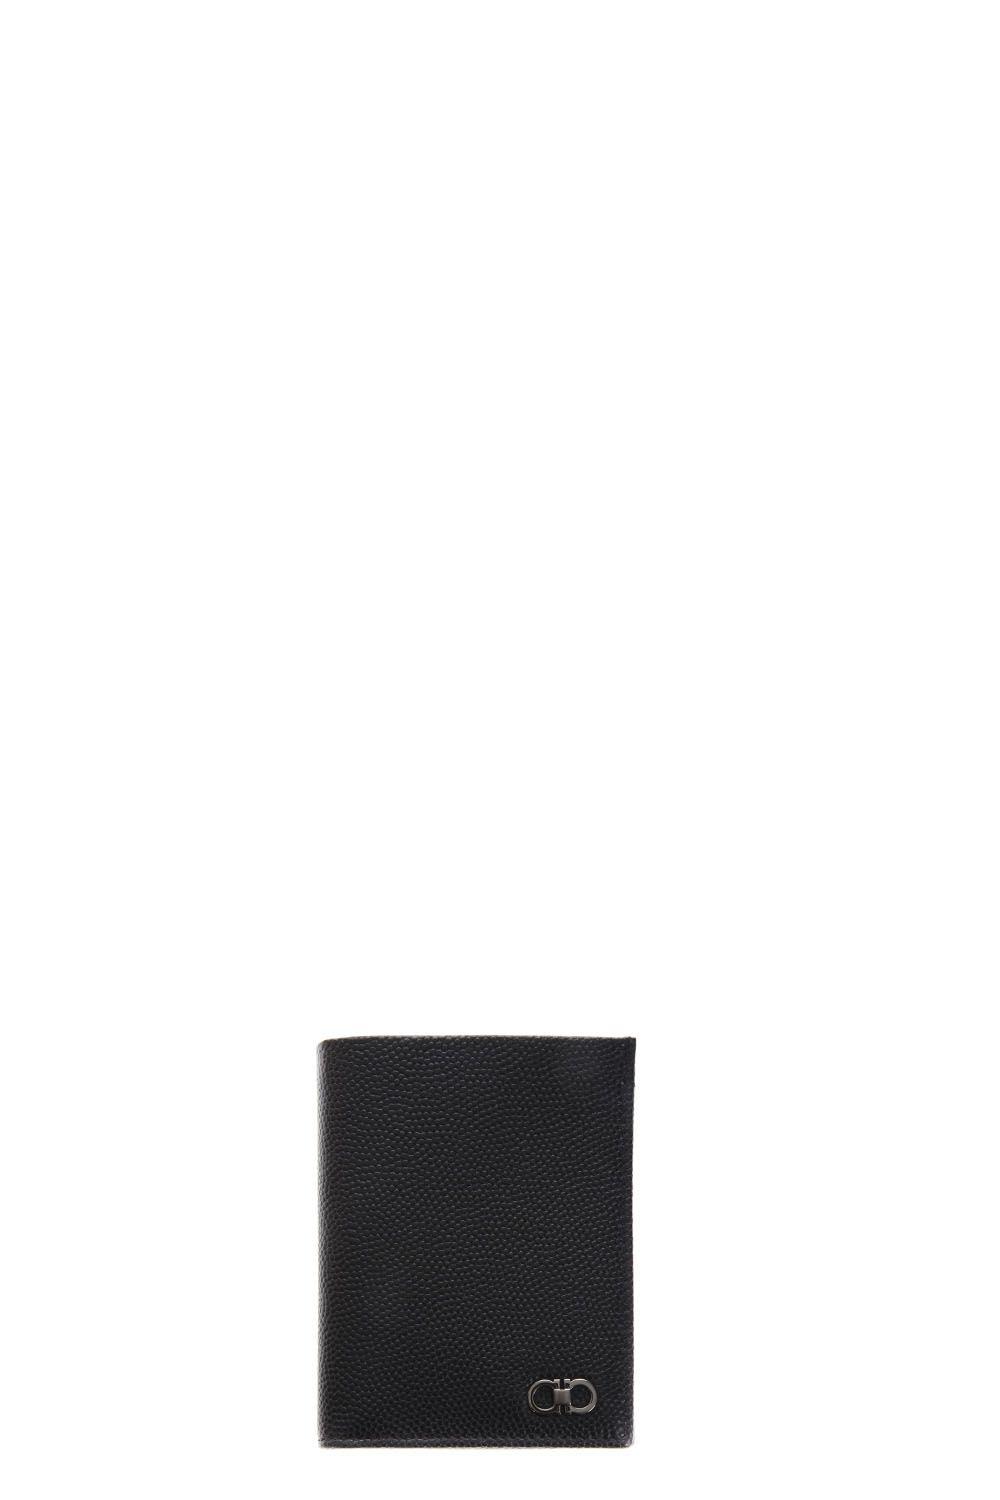 SALVATORE FERRAGAMO Gancino Logo Bi-Fold Wallet in Black